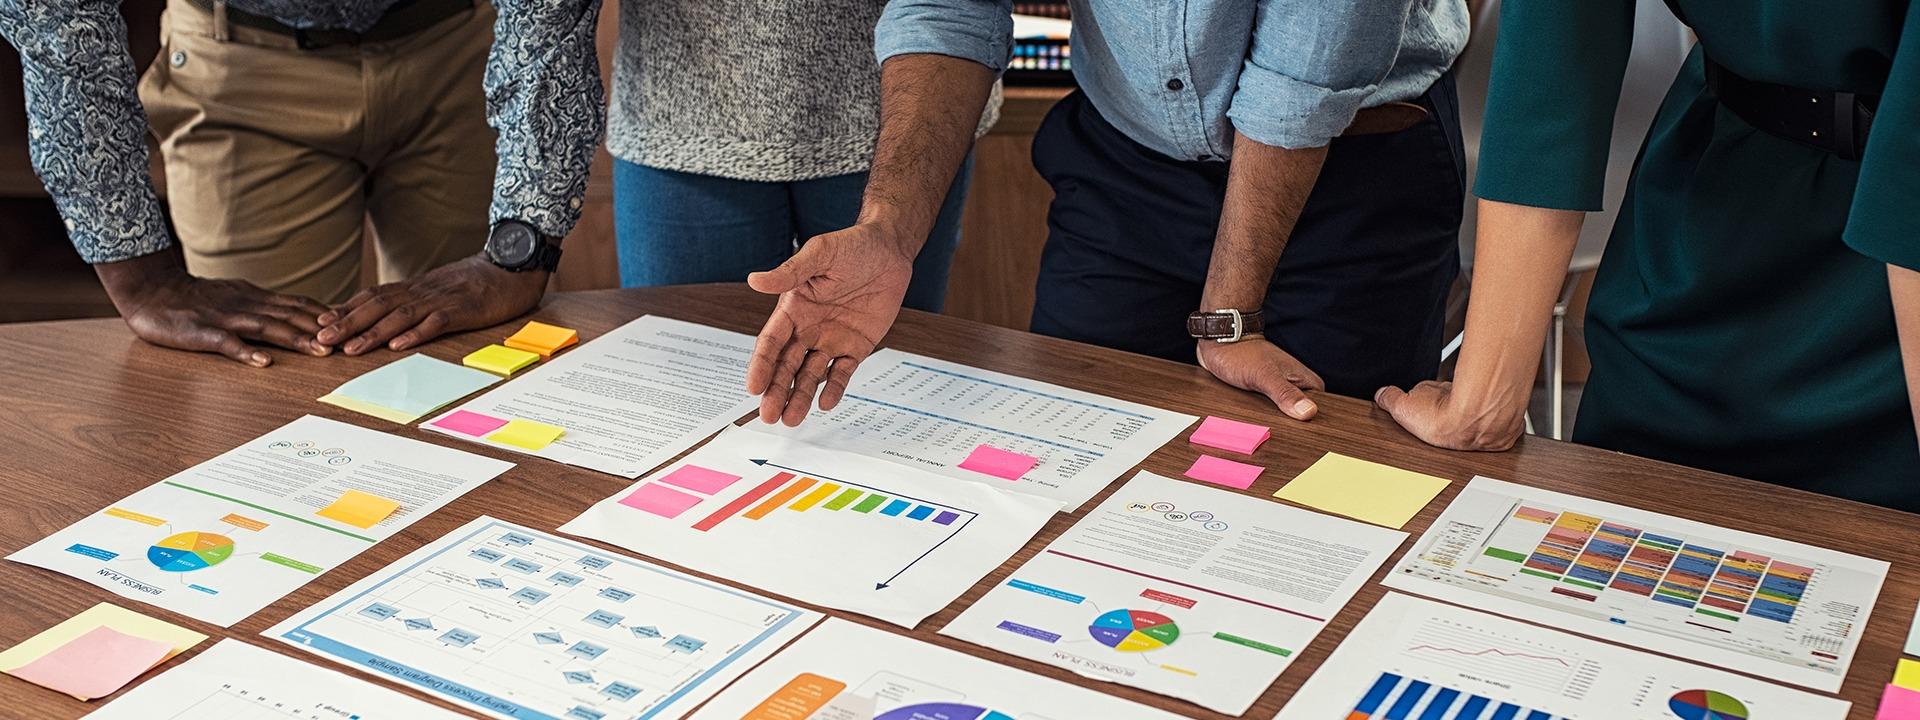 Customer loyalty metrics =- how exactly does one measure customer loyalty?